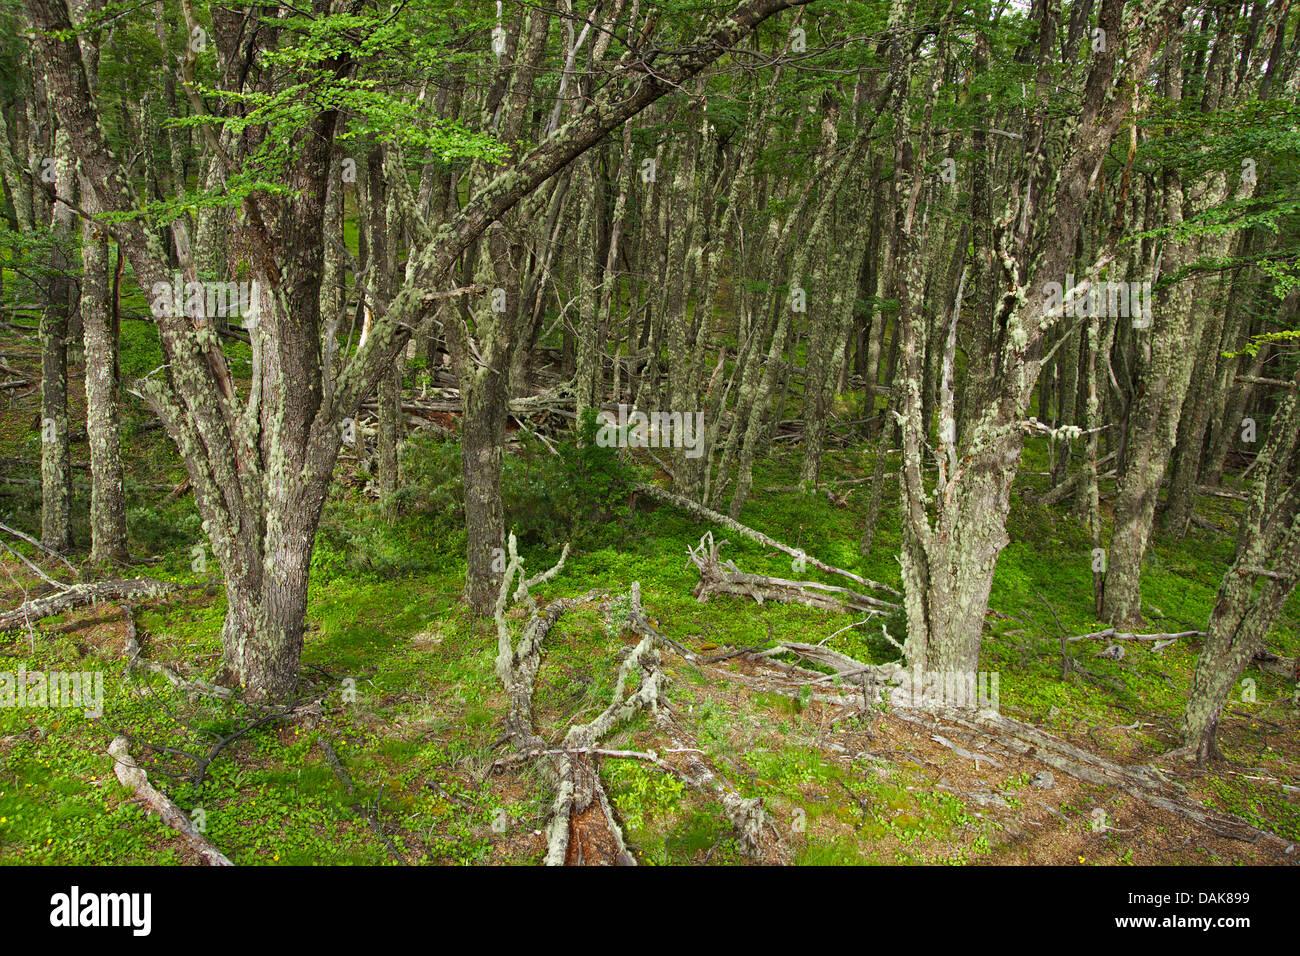 forest near the  Perito-Moreno Glacier, Argentina, Patagonia, Andes, Los Glaciares National Park - Stock Image